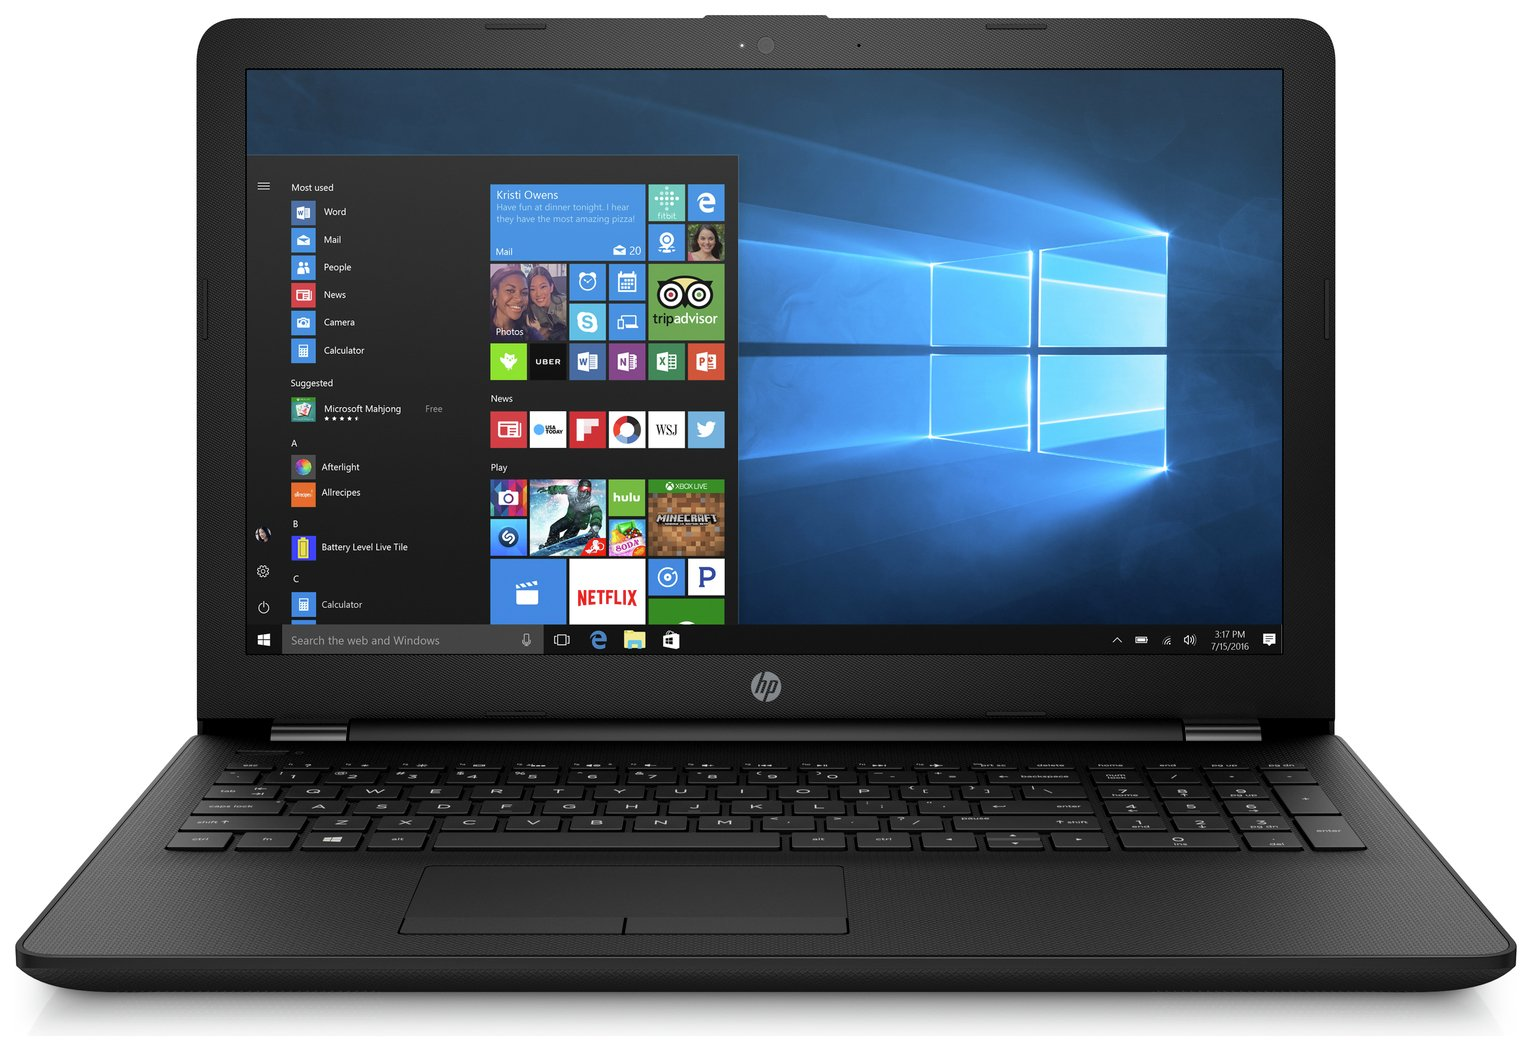 HP 15.6 Inch Intel Celeron 4GB 1TB Laptop - Grey